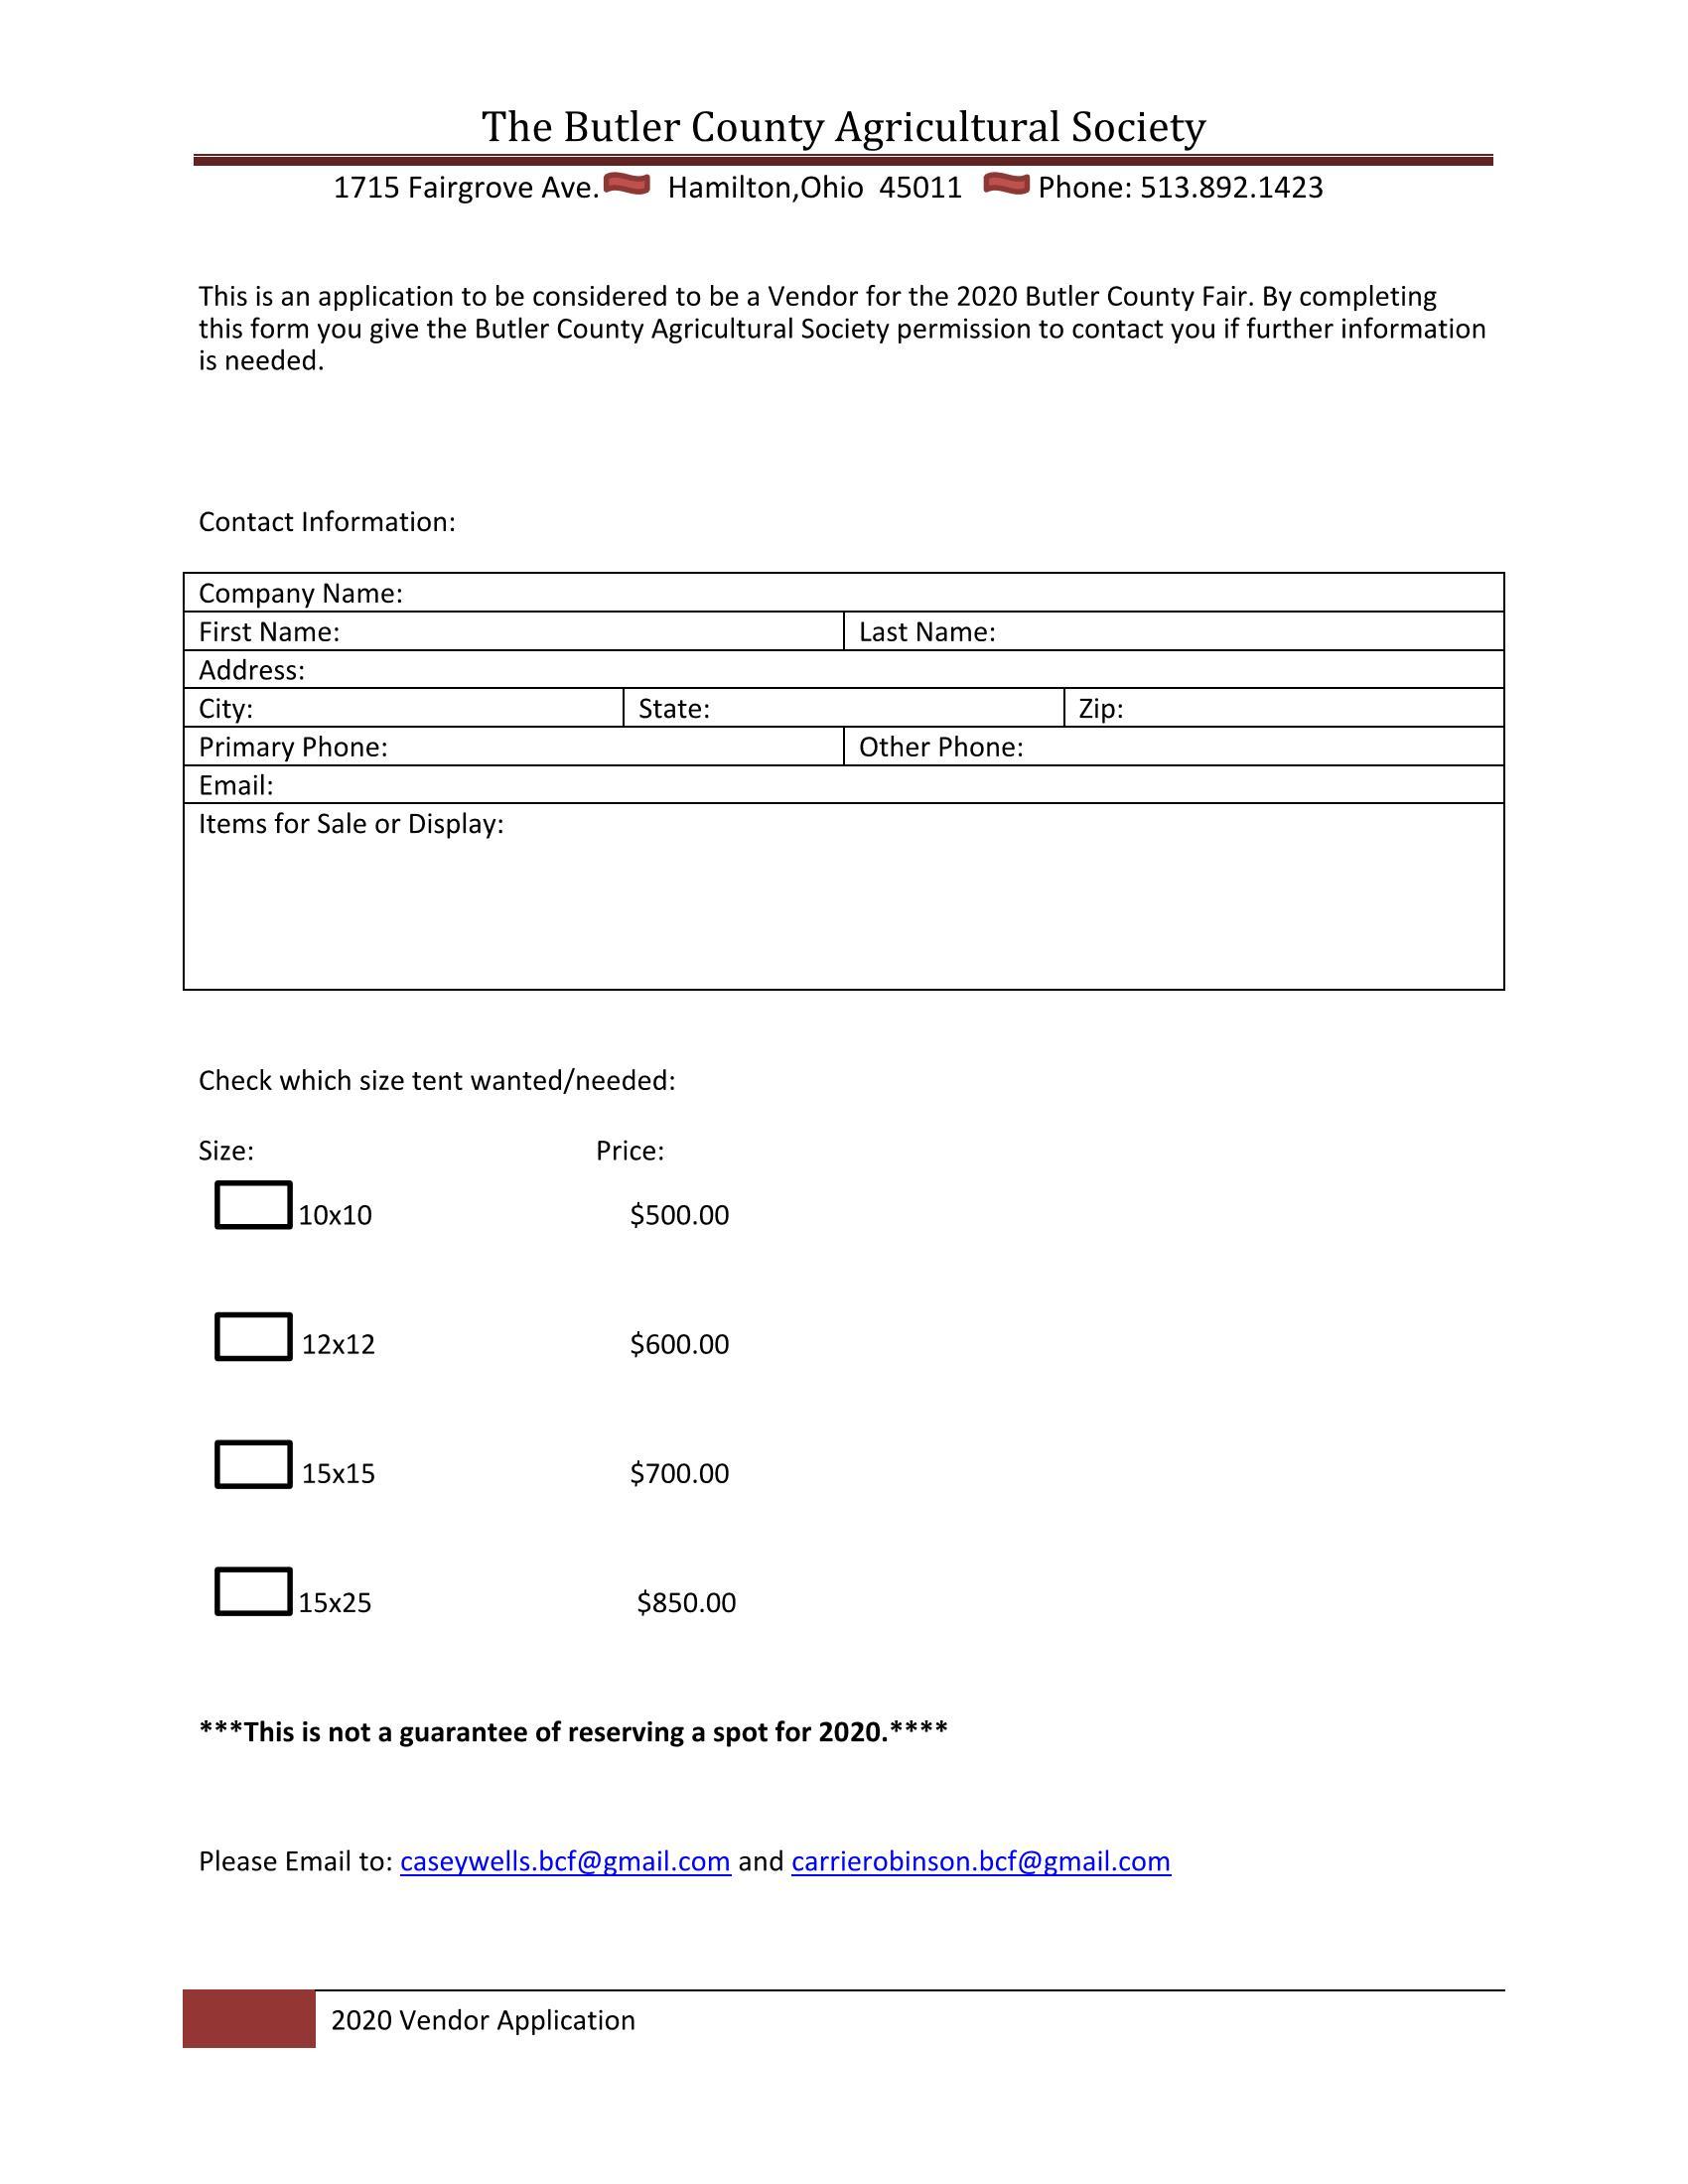 Vendor Contact Form 2020_Page_1